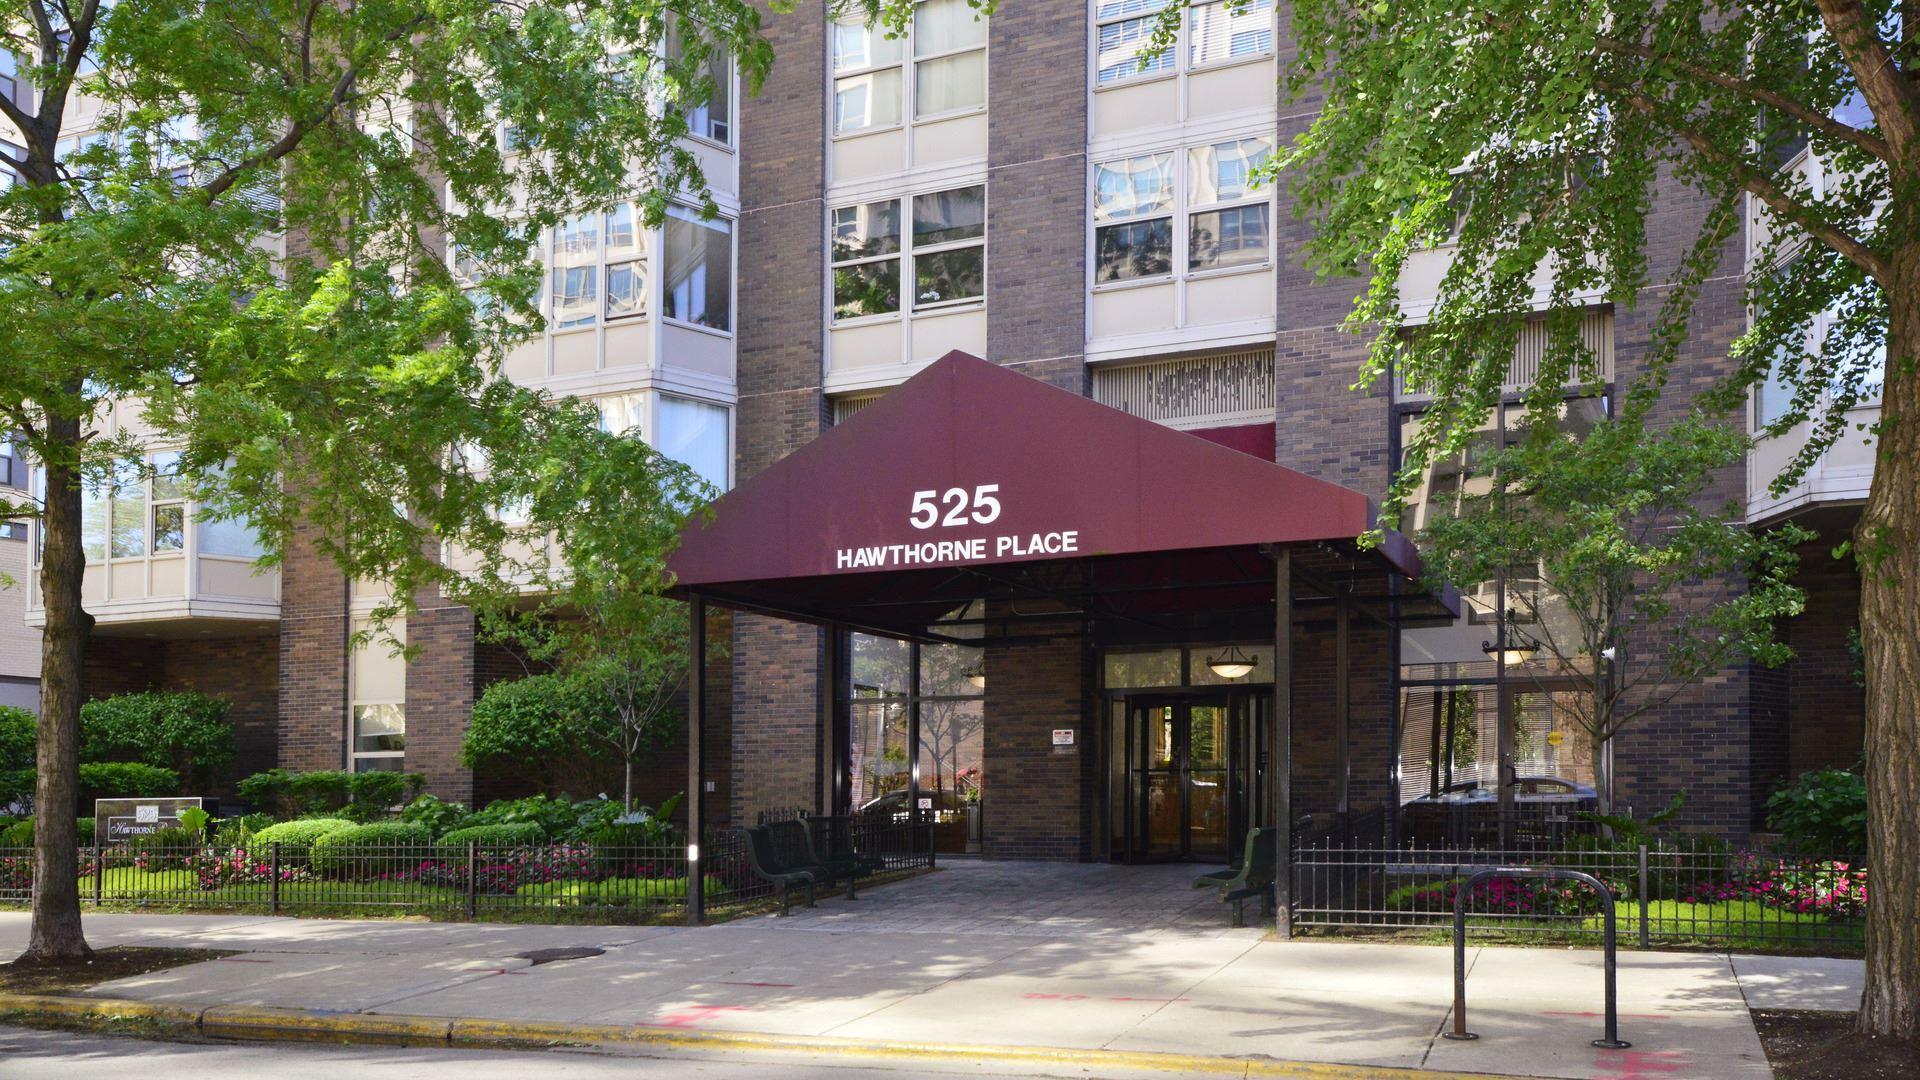 525 W HAWTHORNE Place #2301, Chicago, IL 60657 - #: 10773683